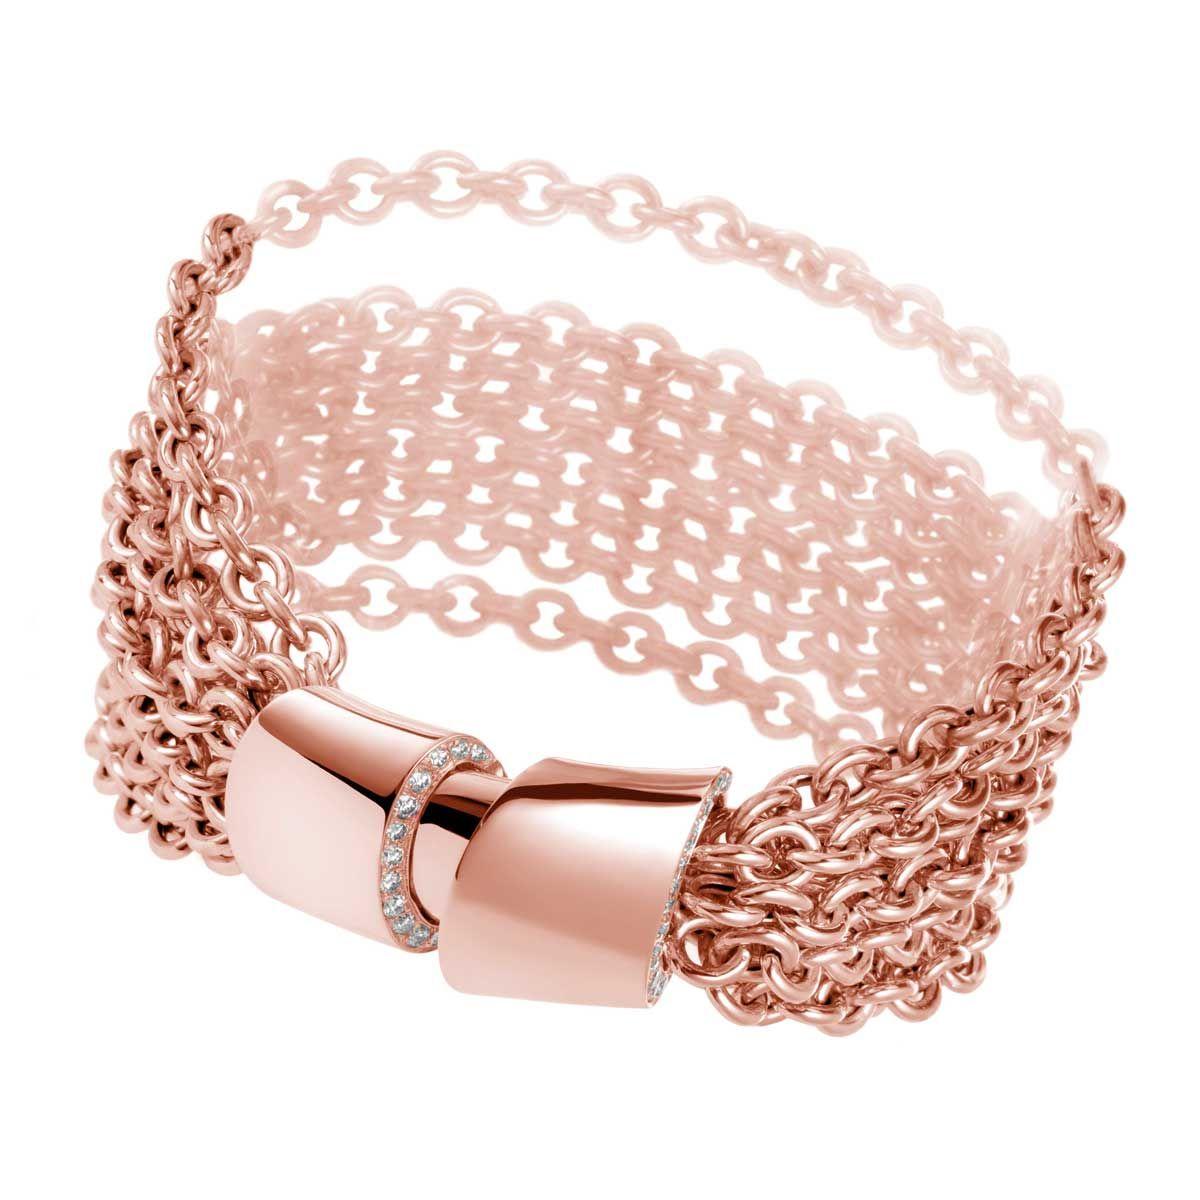 Bracelet in rose gold with diamonds by de grisogono jewelry rose